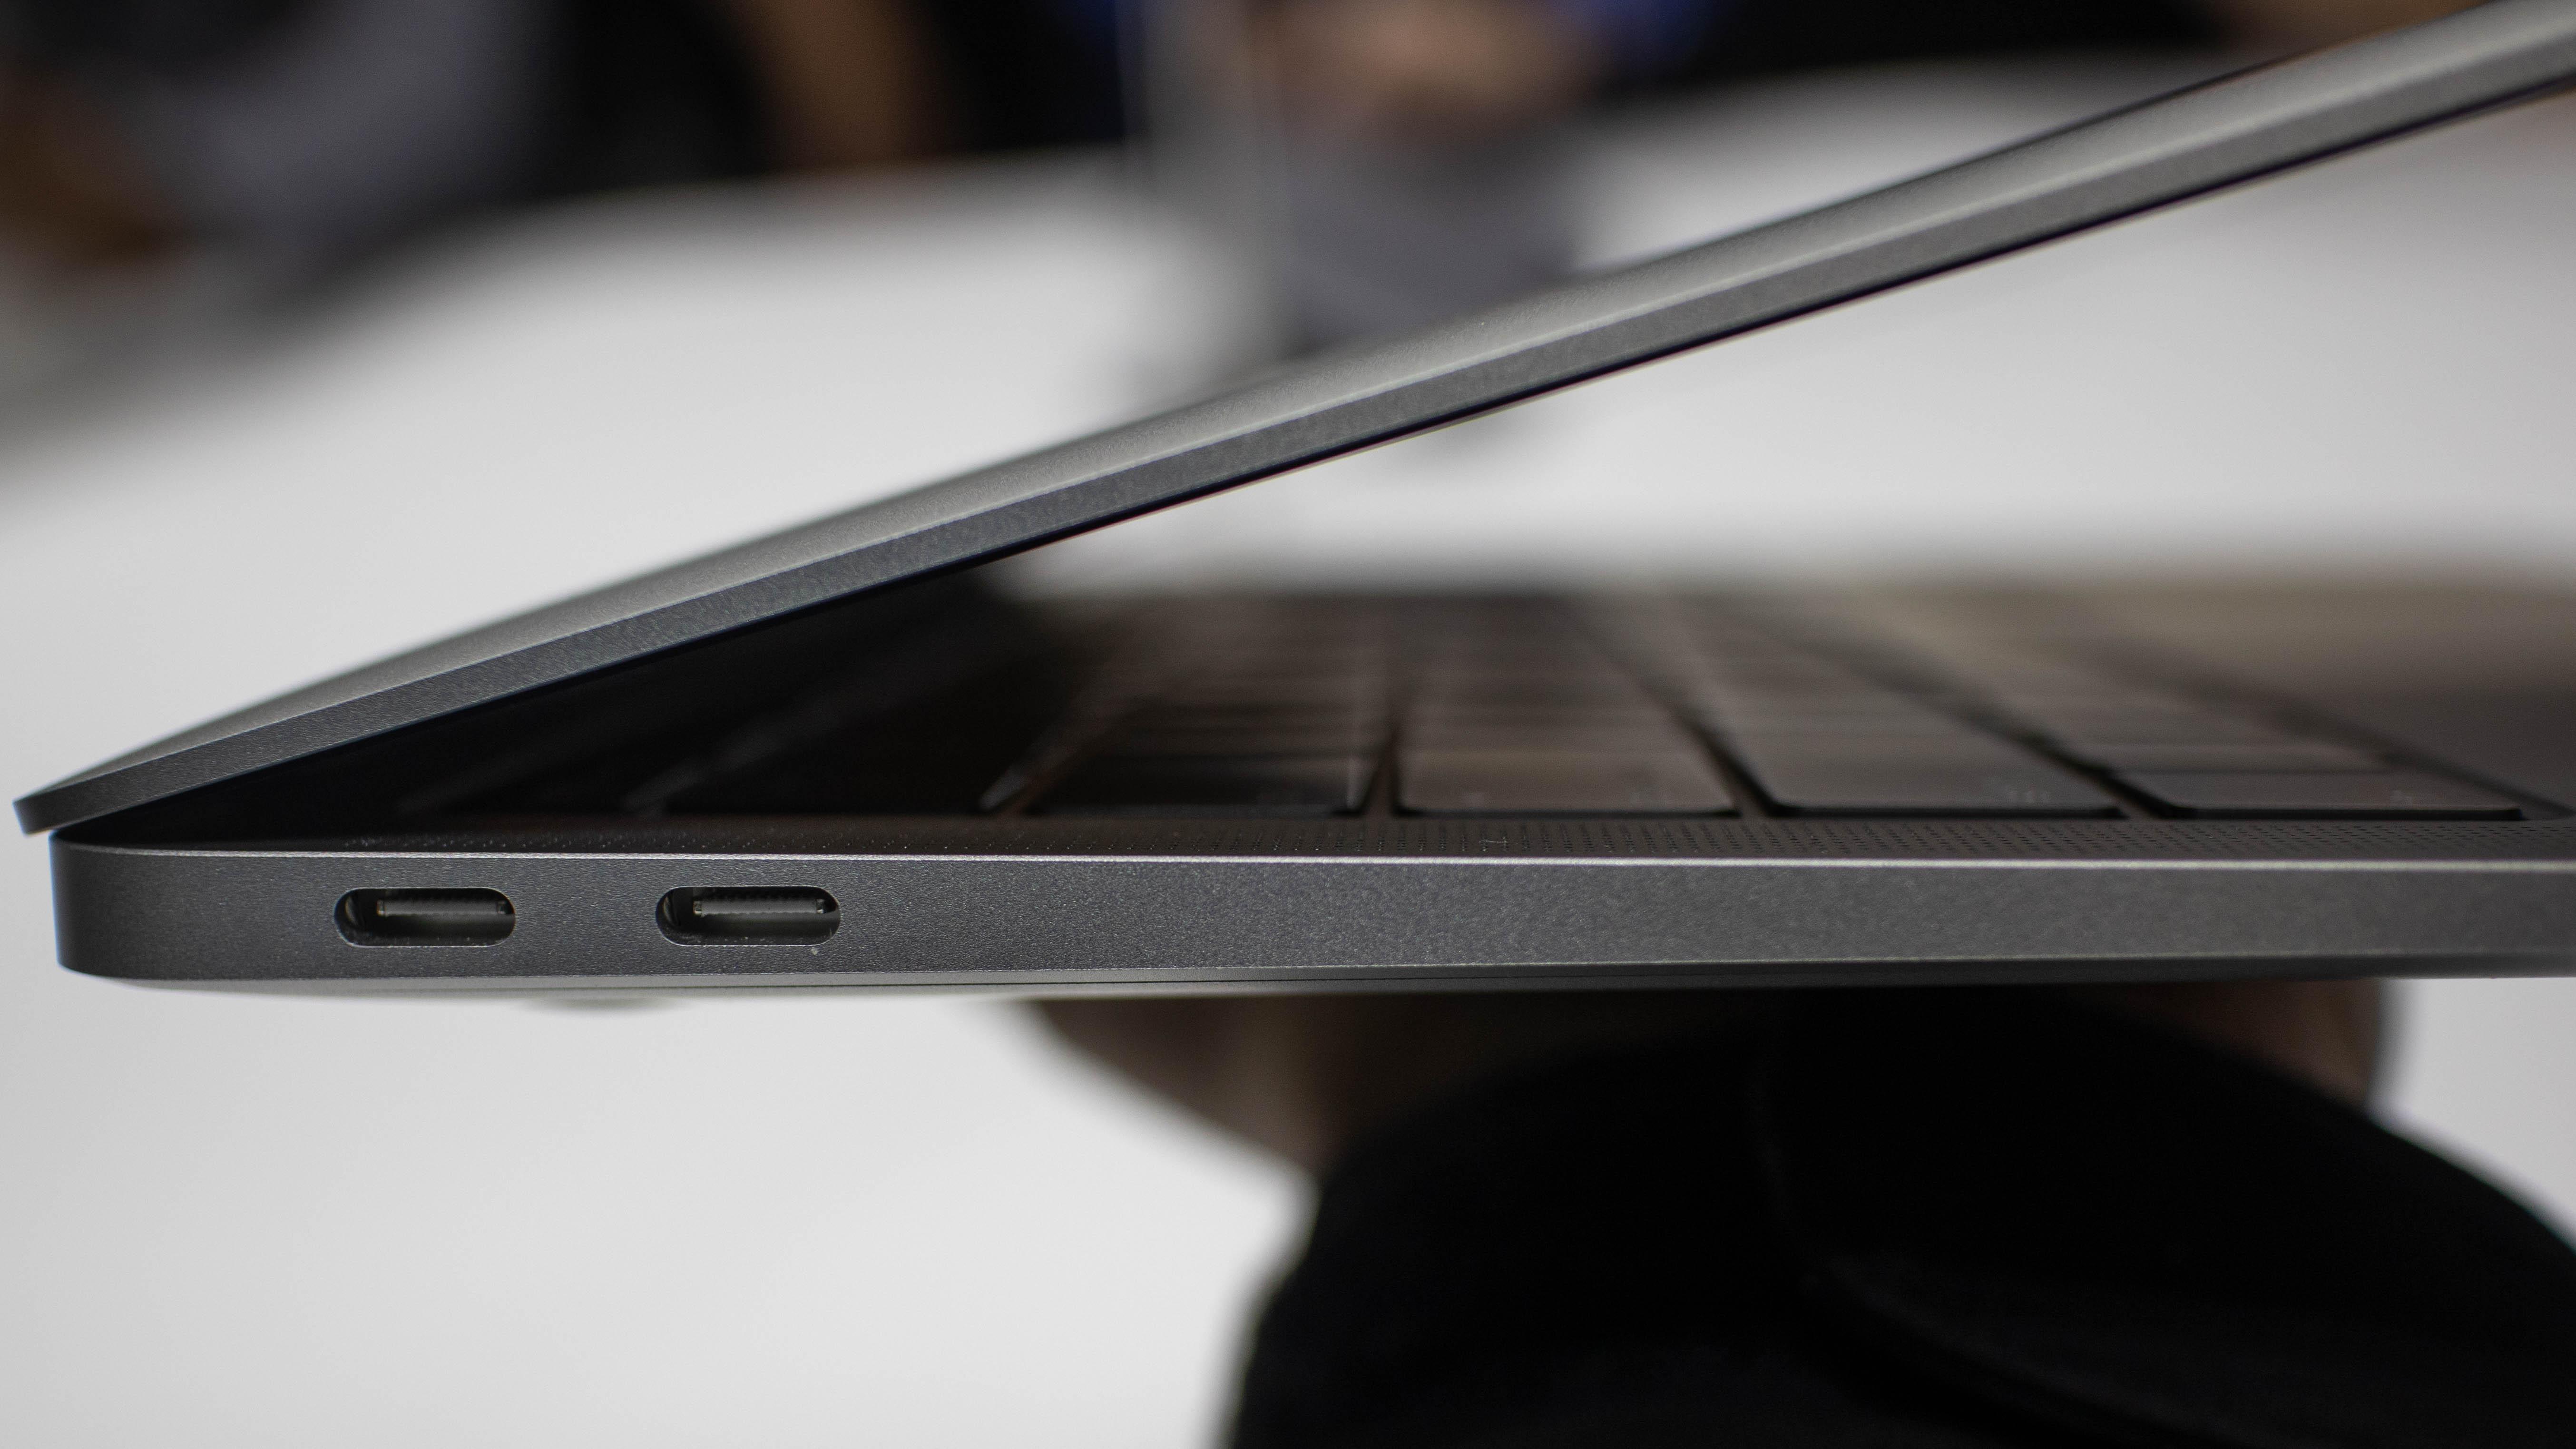 Apple releases macOS Mojave update to improve MacBook Air (2018